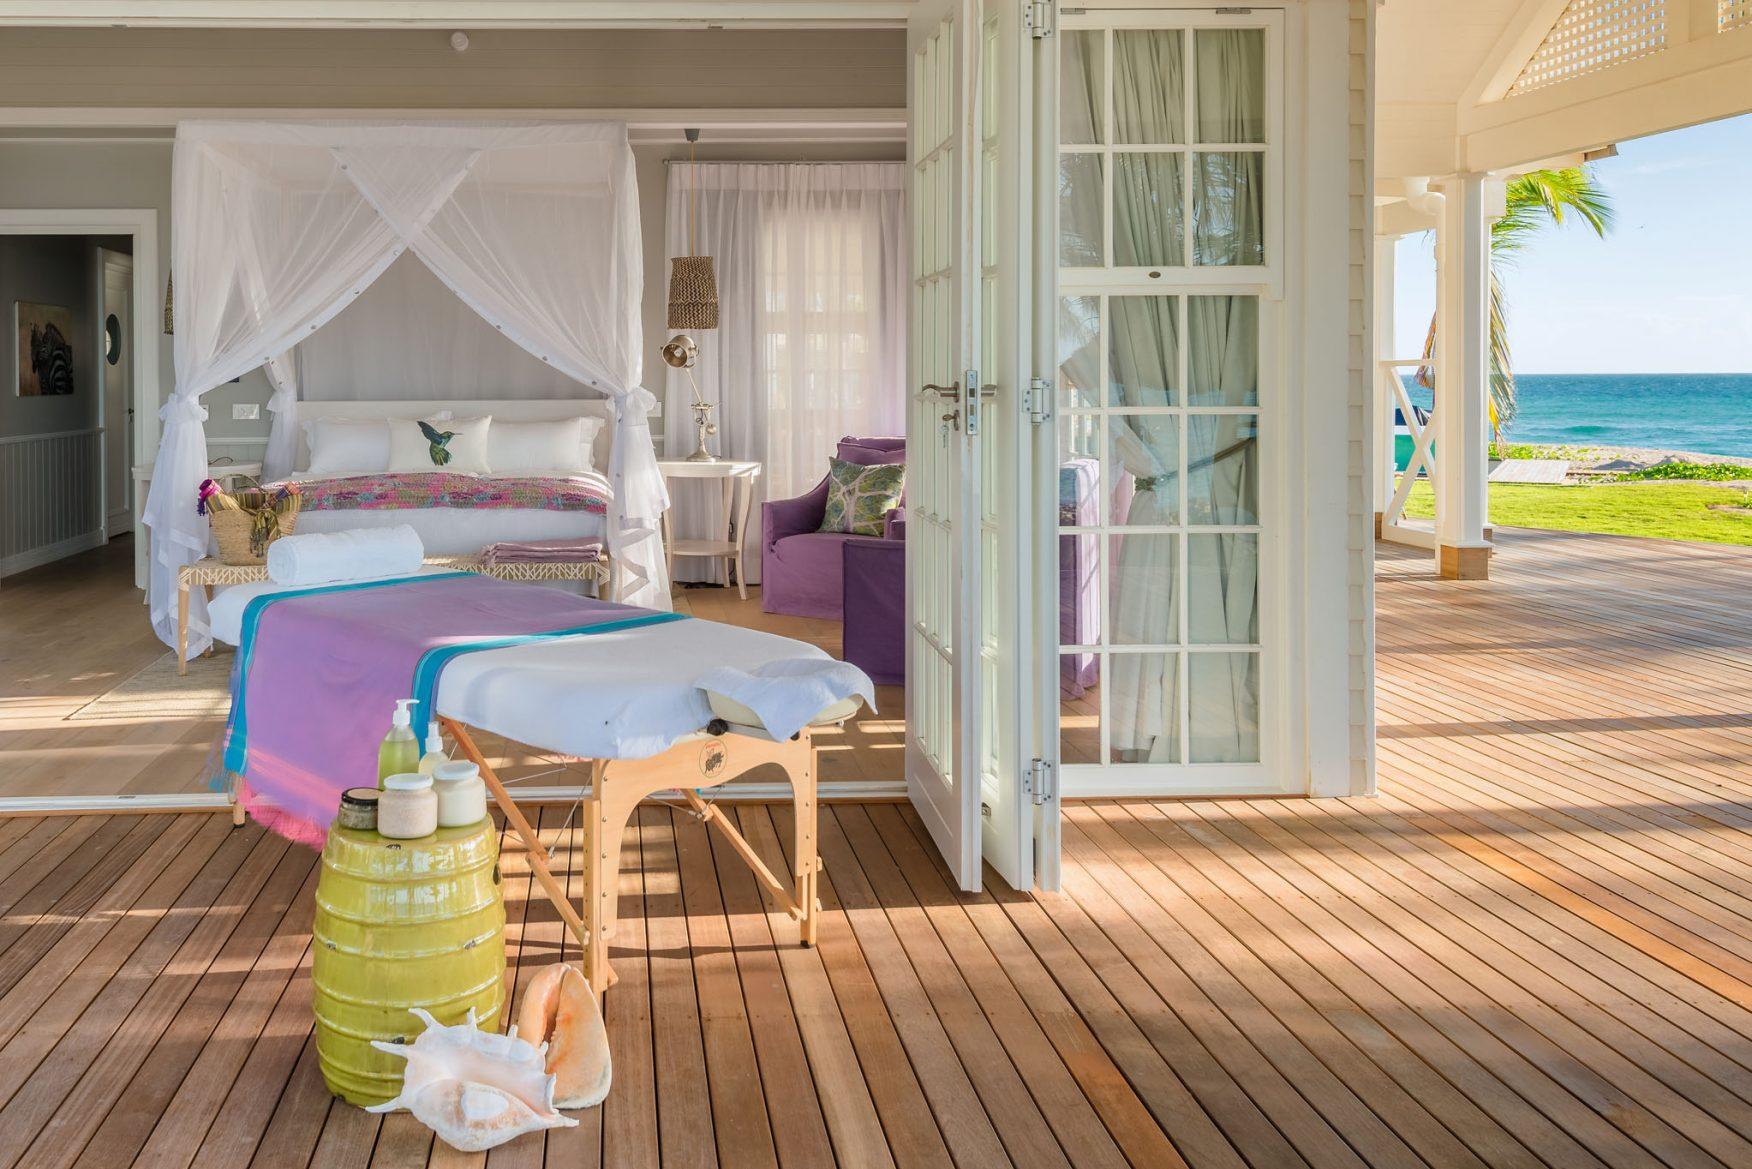 villa-main-bedroom-spa-treatment-1